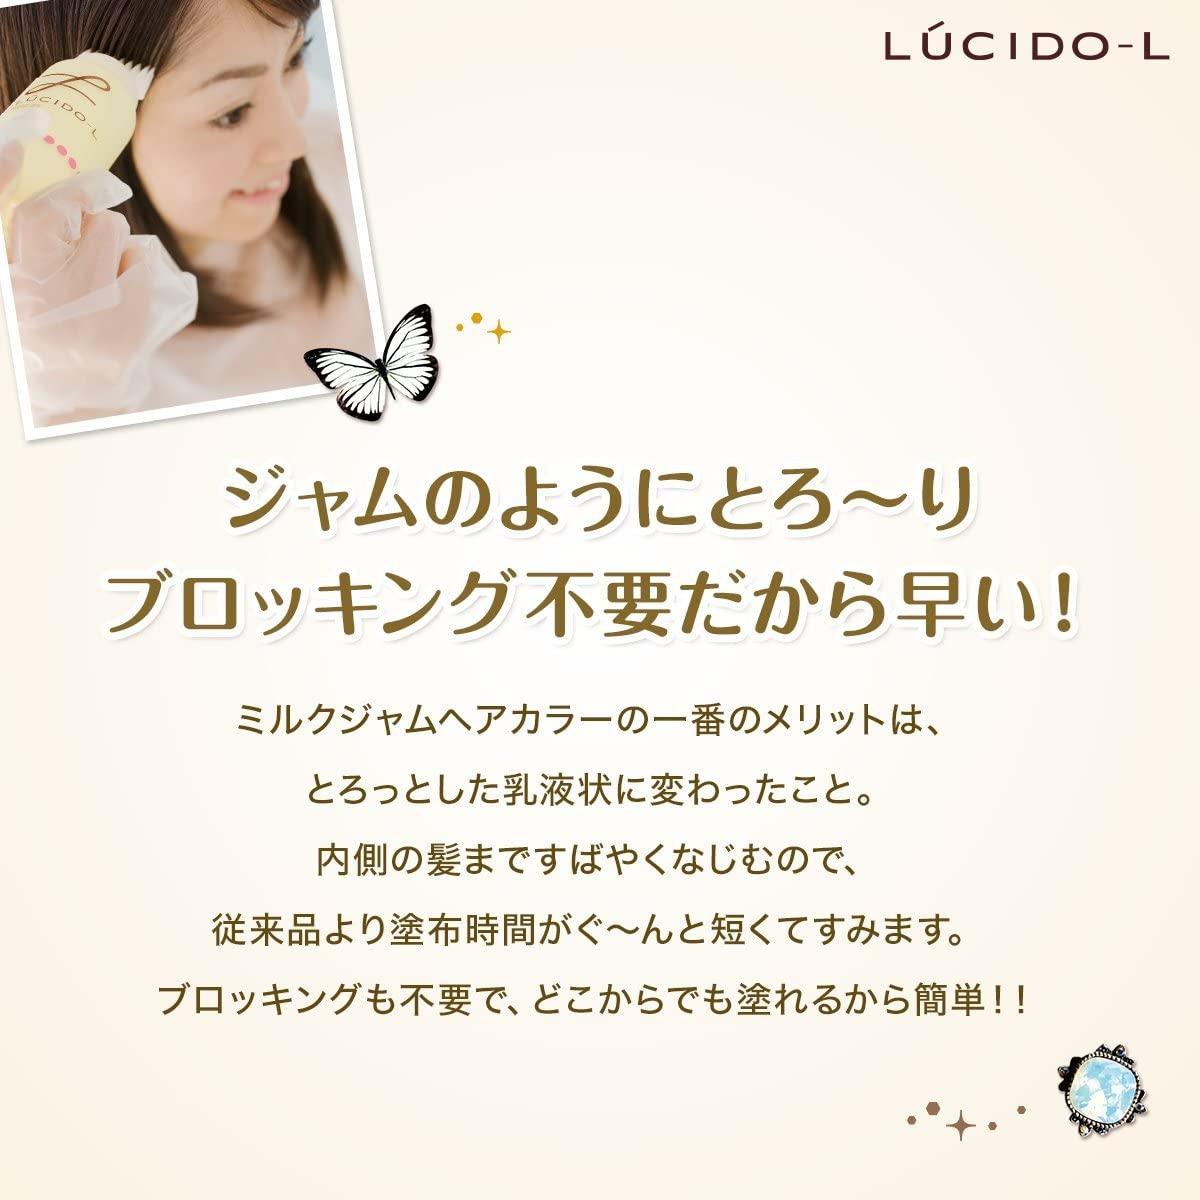 LUCIDO-L(ルシードエル) ミルクジャムヘアカラーの商品画像6